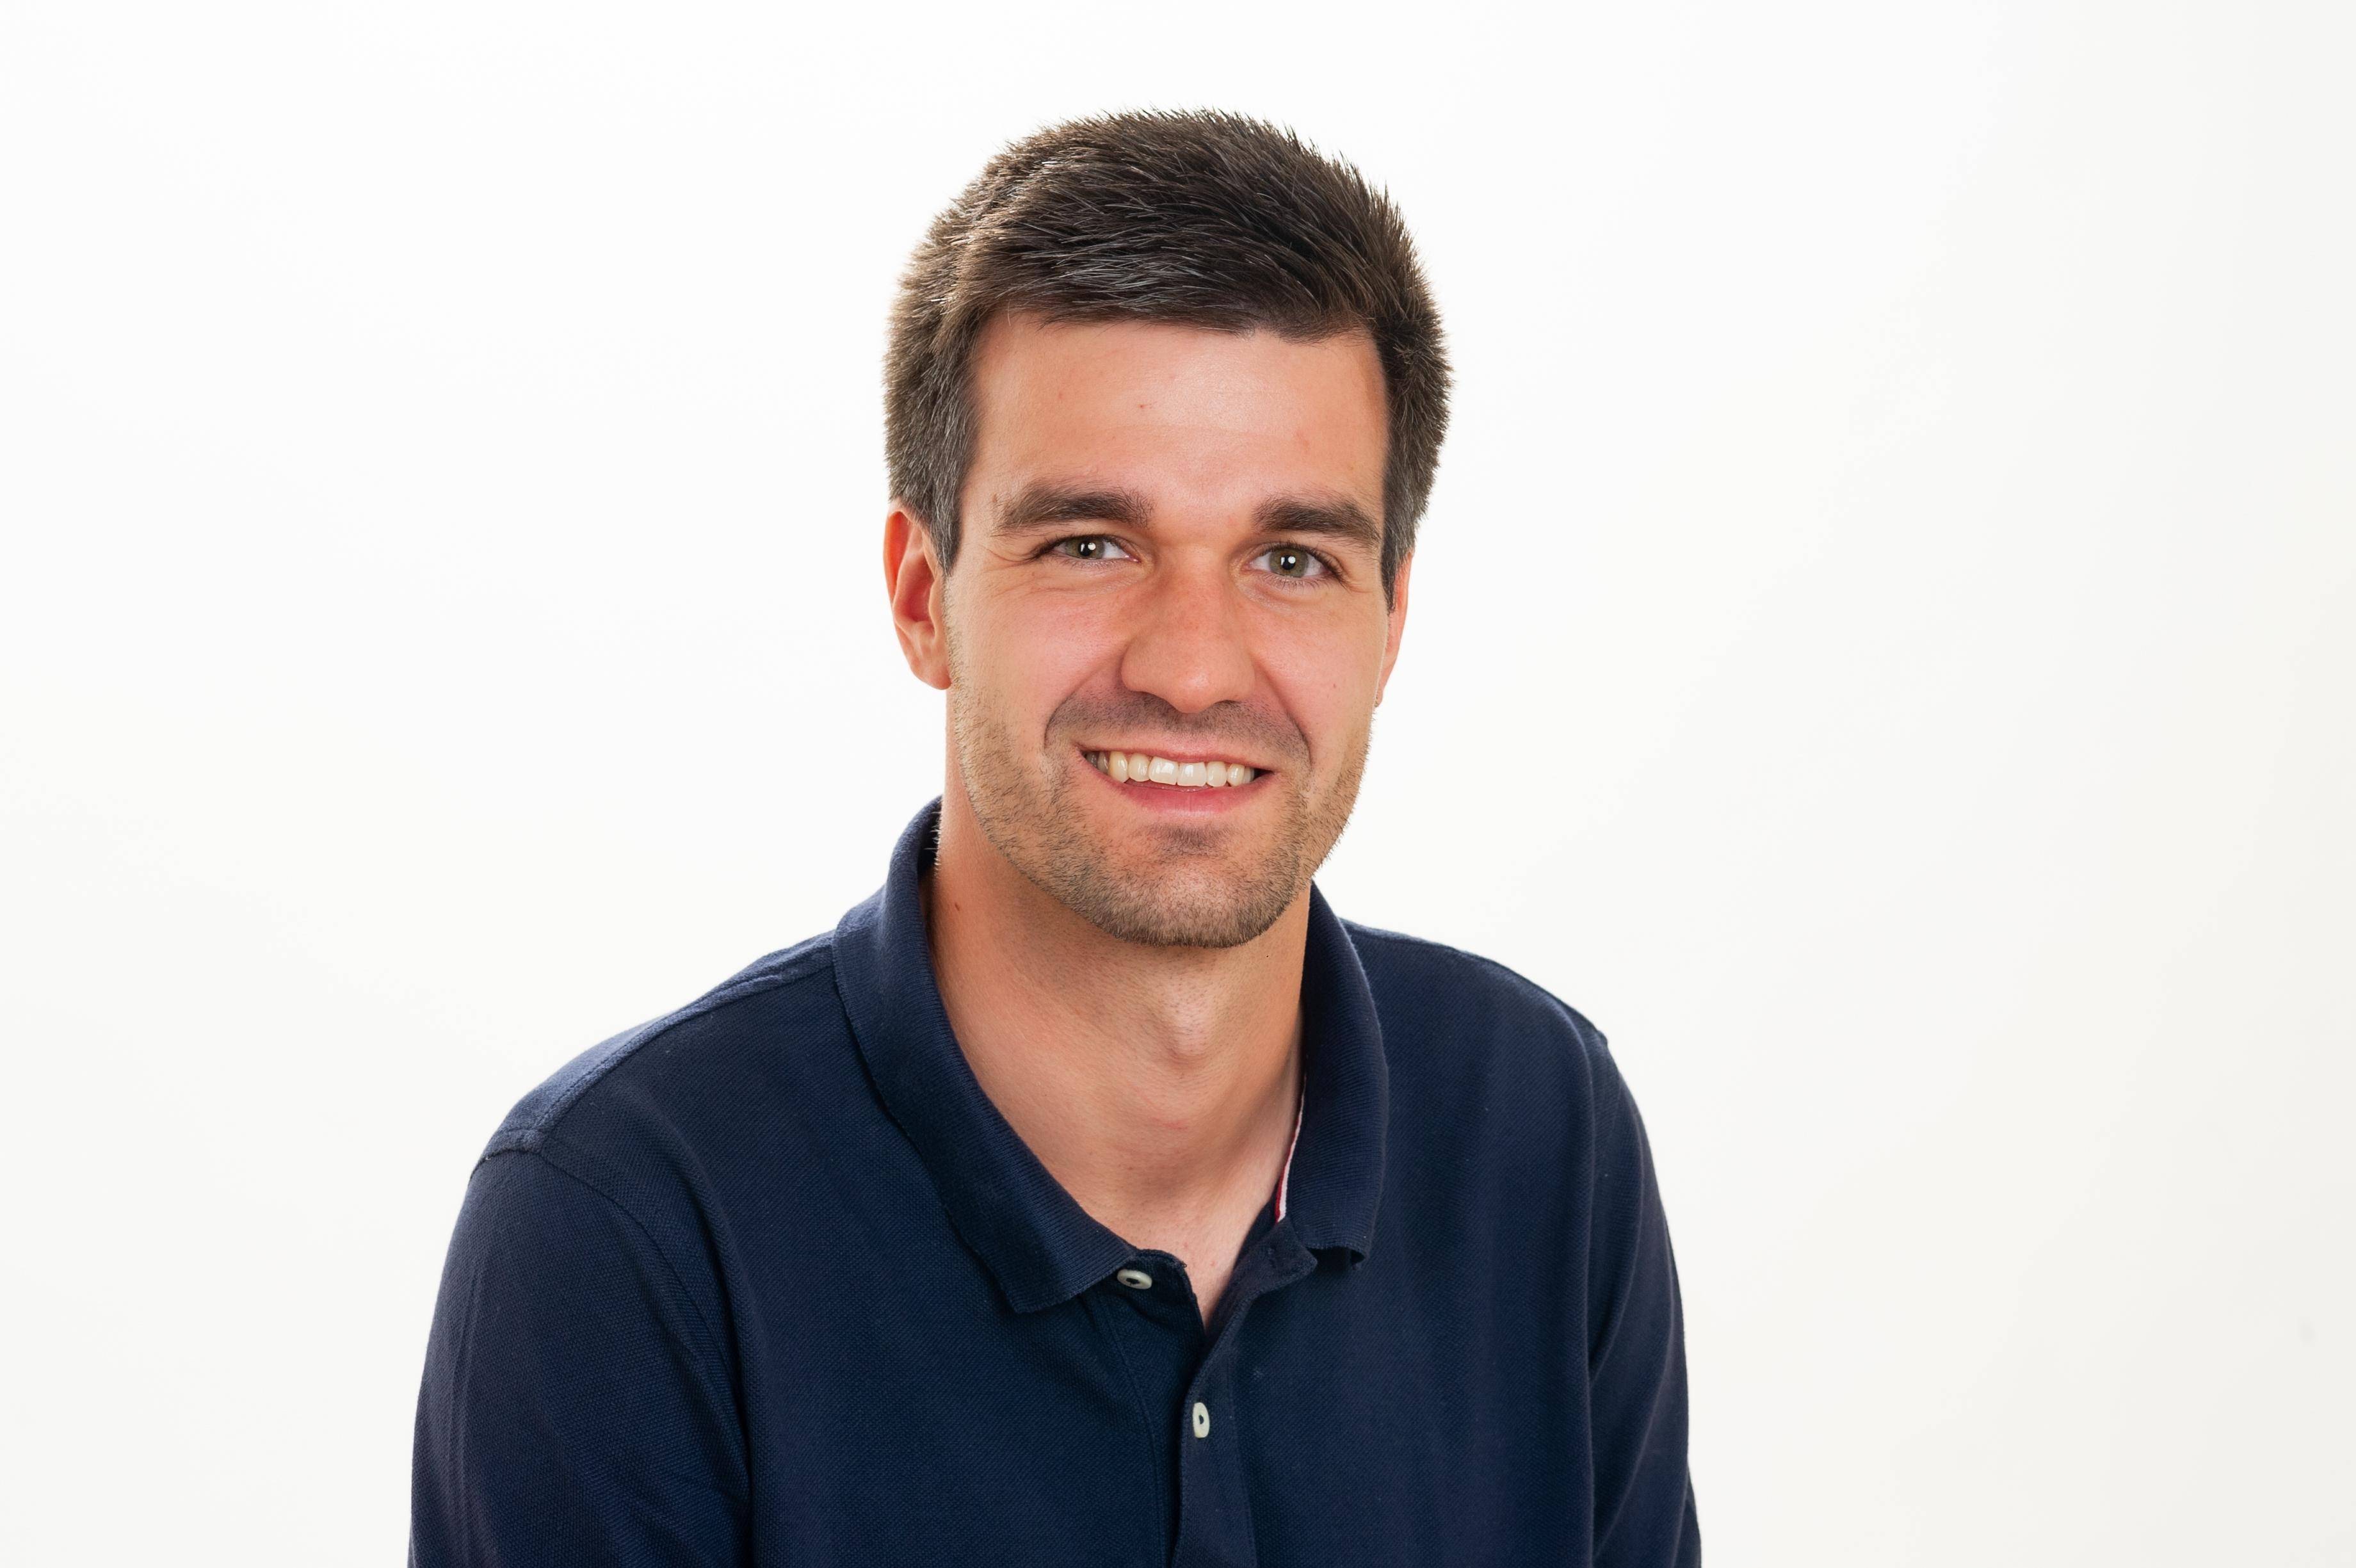 Philipp Gerber